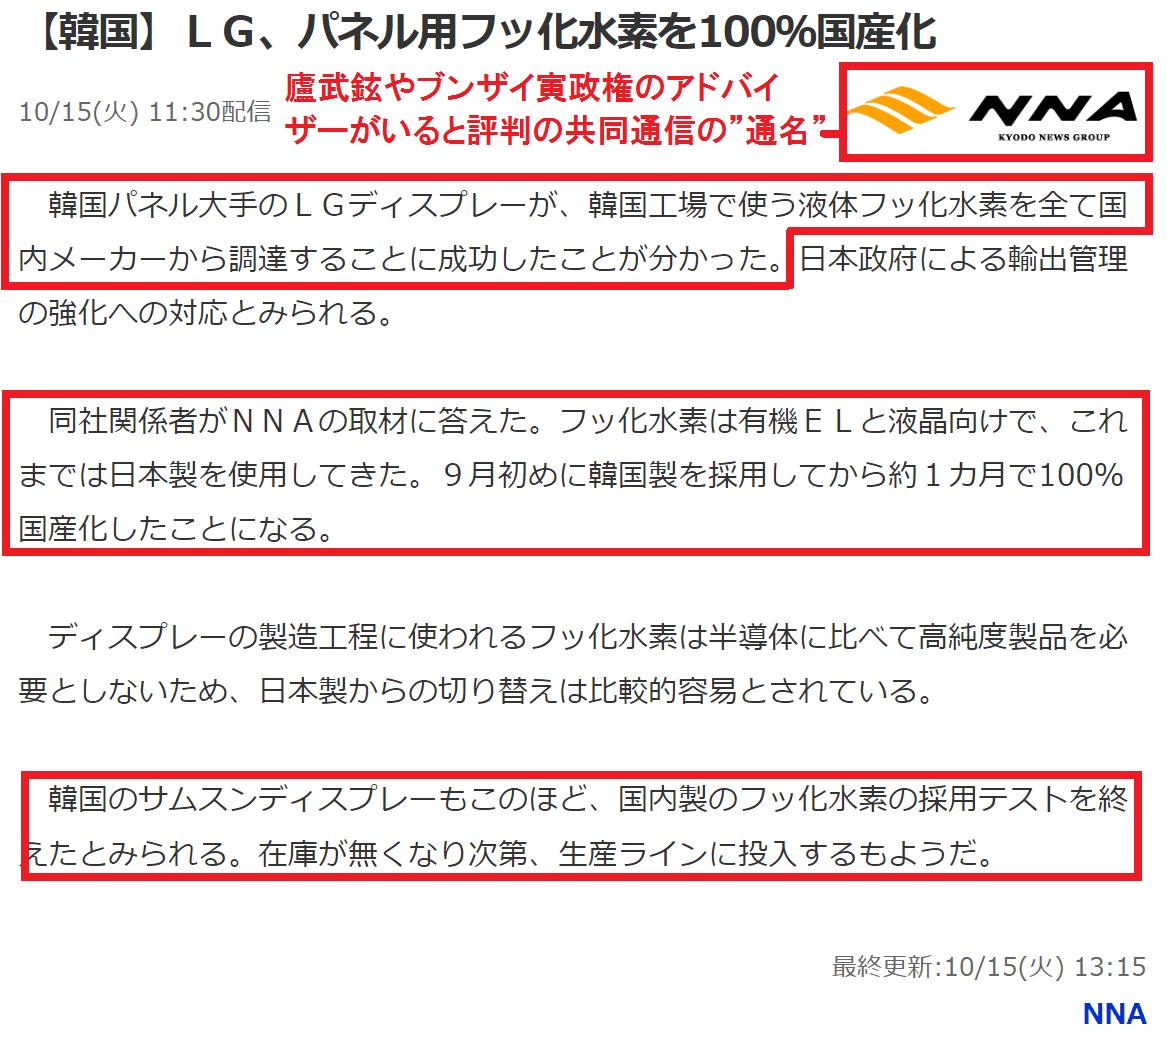 NNAこと共同通信が輸出管理規制品を下朝鮮が自国産を使うと報道